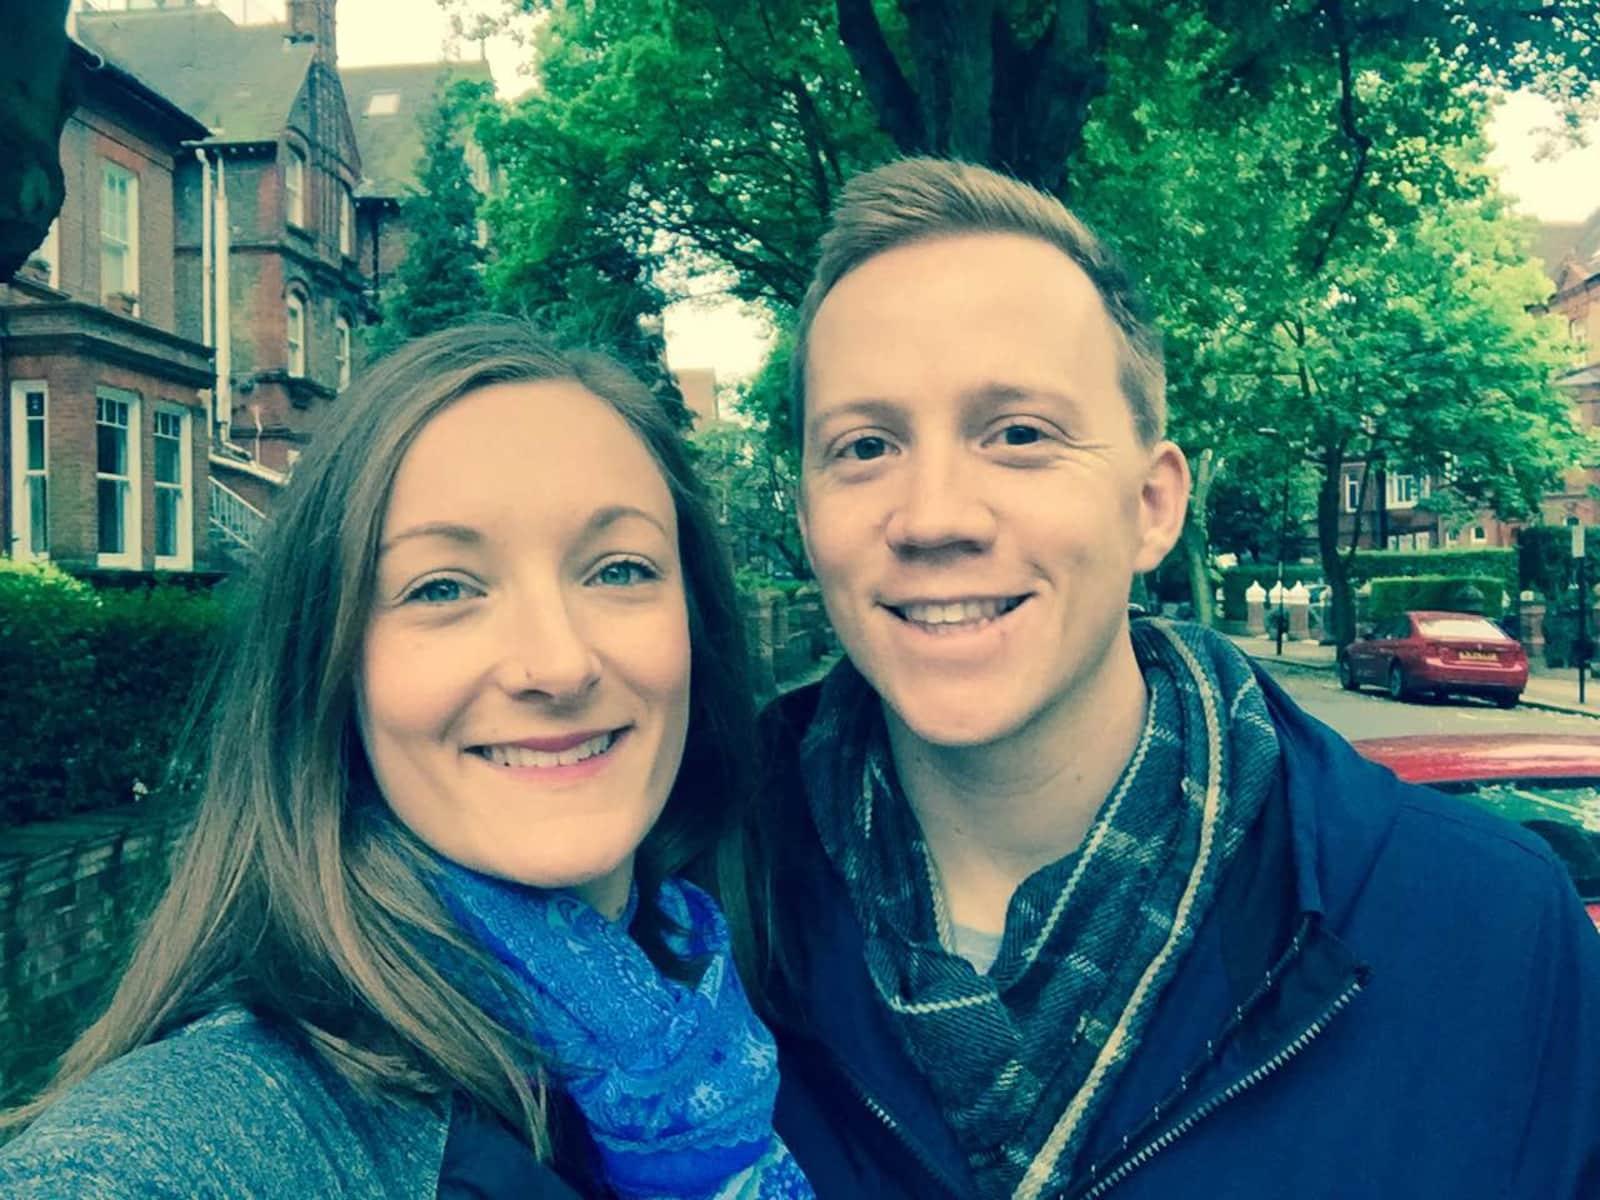 Daniel & Renee from London, United Kingdom